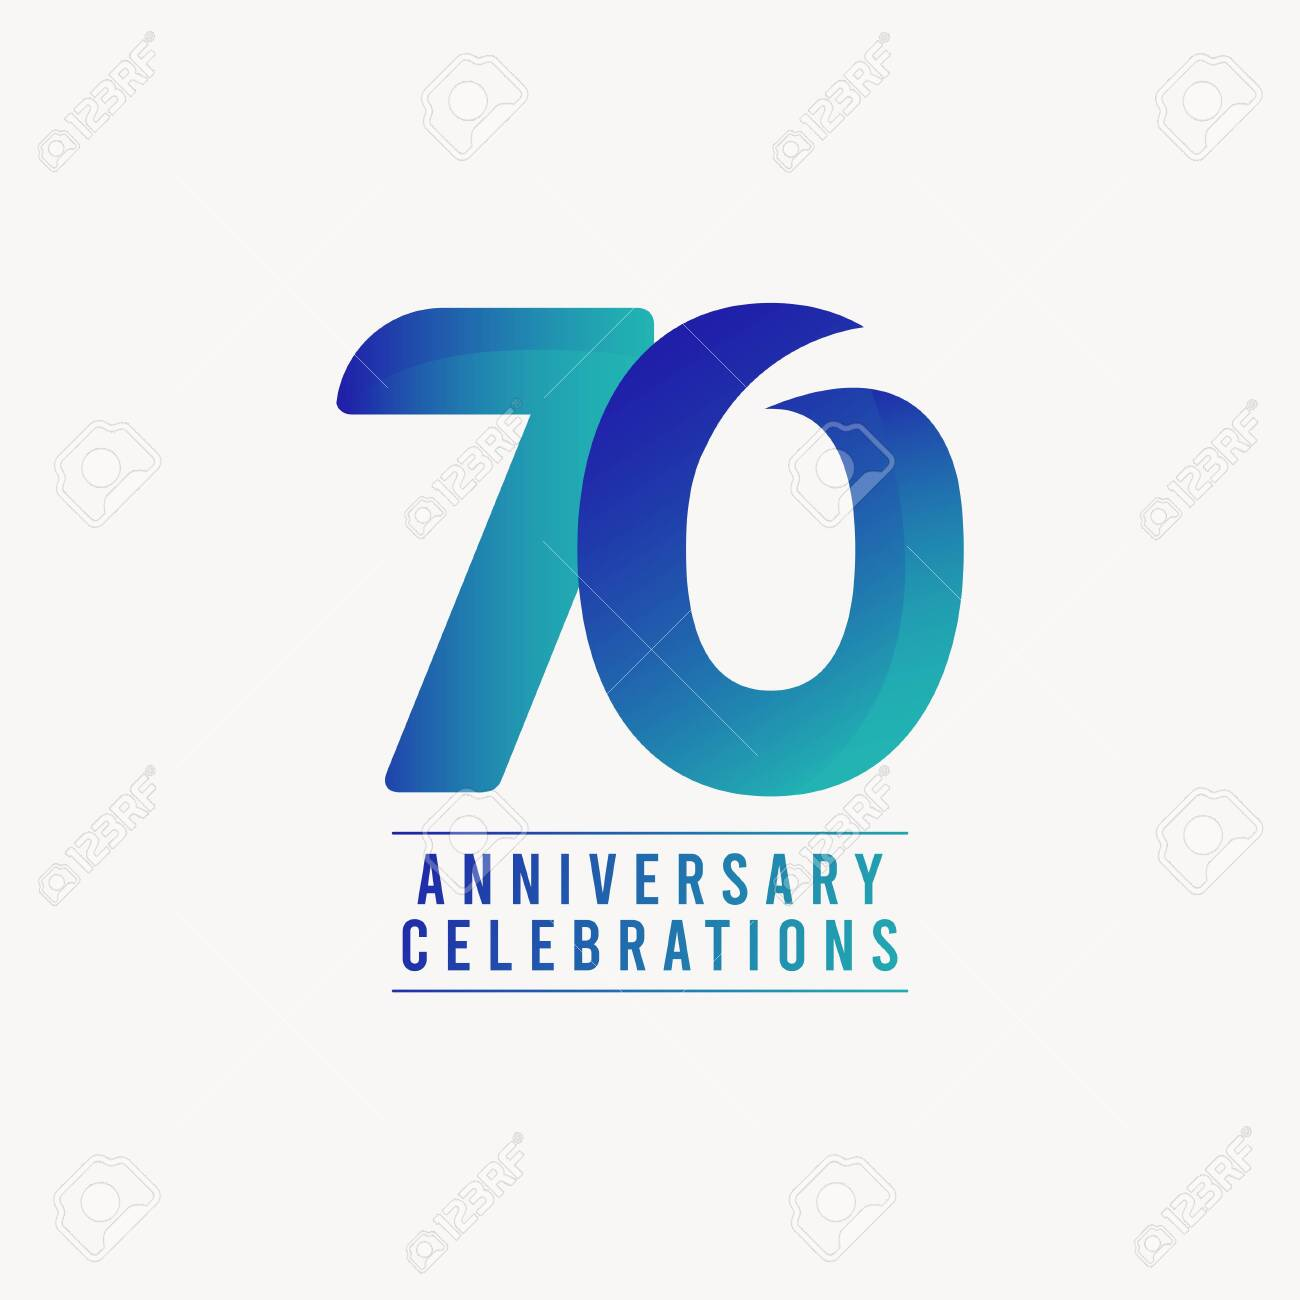 70 Years Anniversary Celebrations Vector Template Design Illustration - 140343359